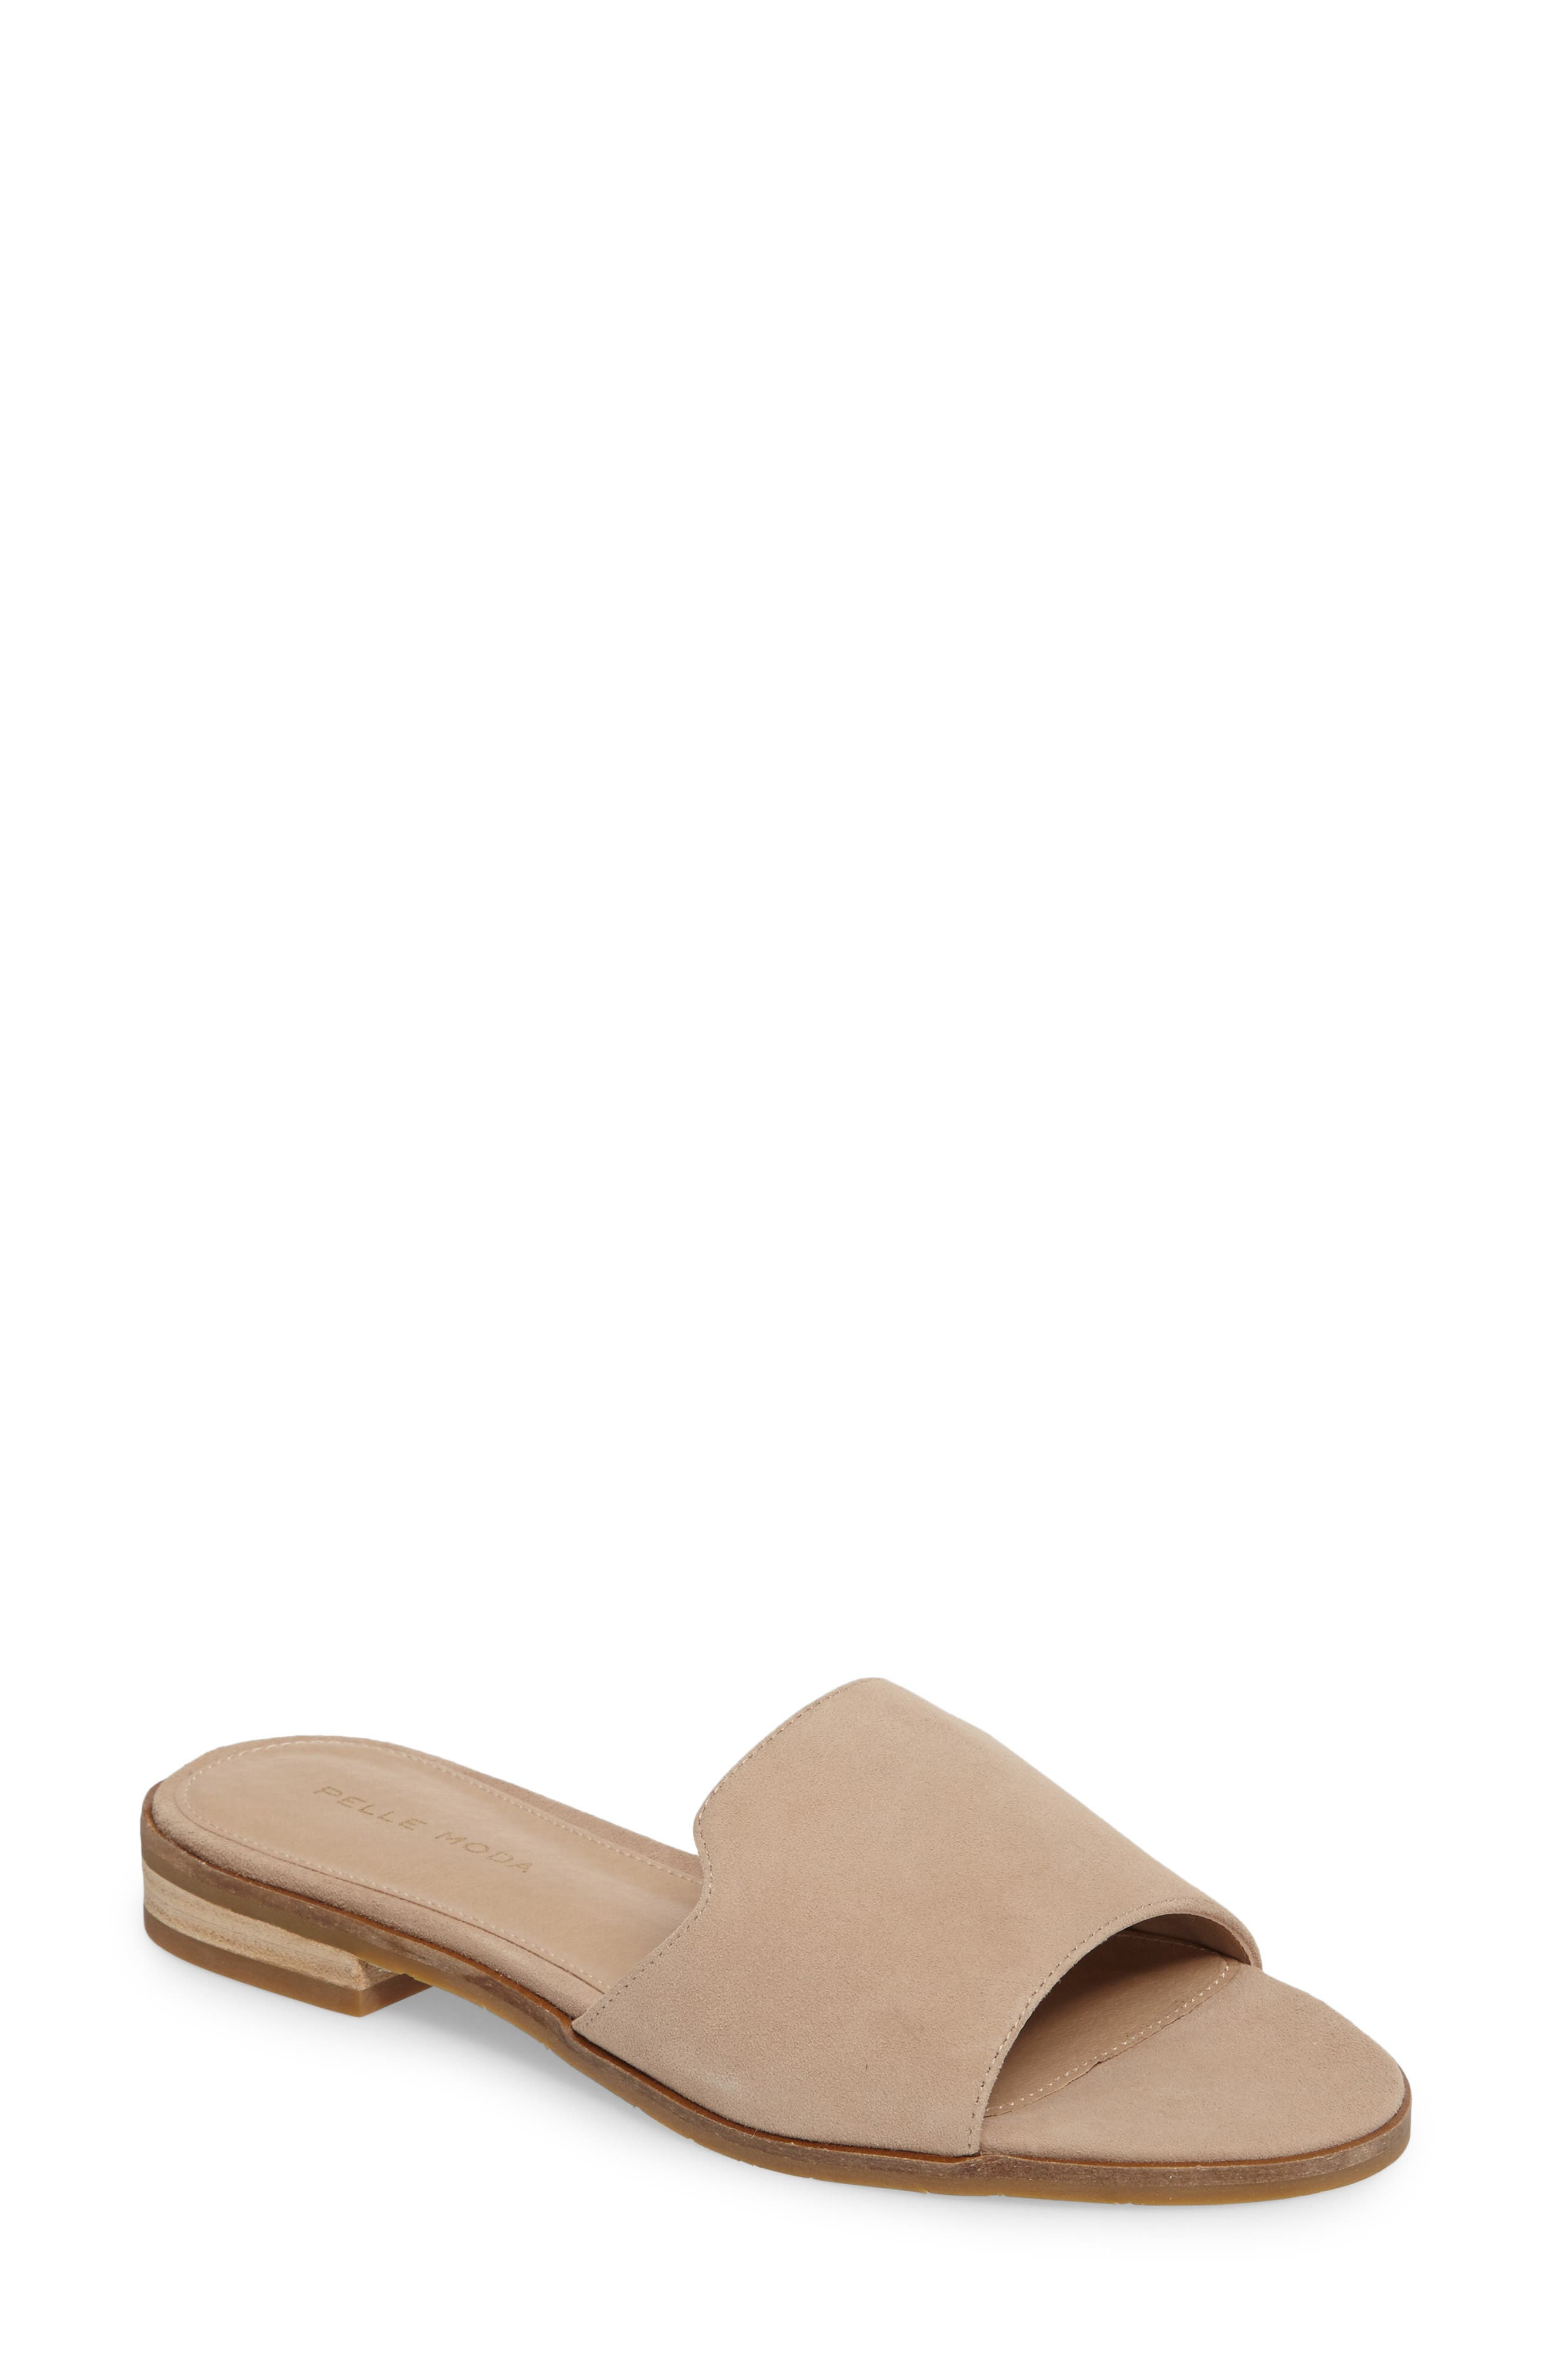 Hailey Slide Sandal,                         Main,                         color, Sand Leather